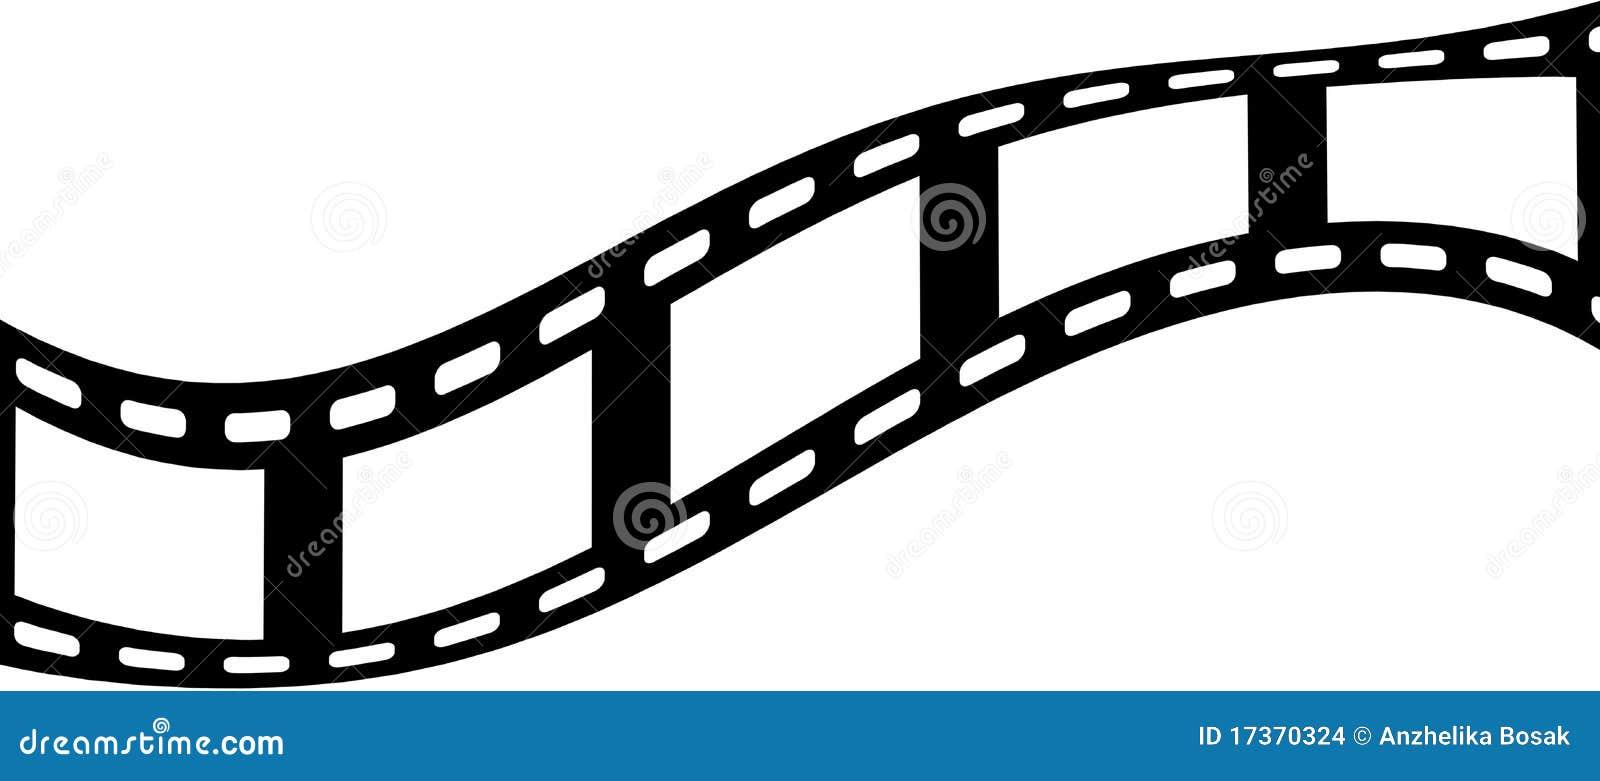 Five blank film frames